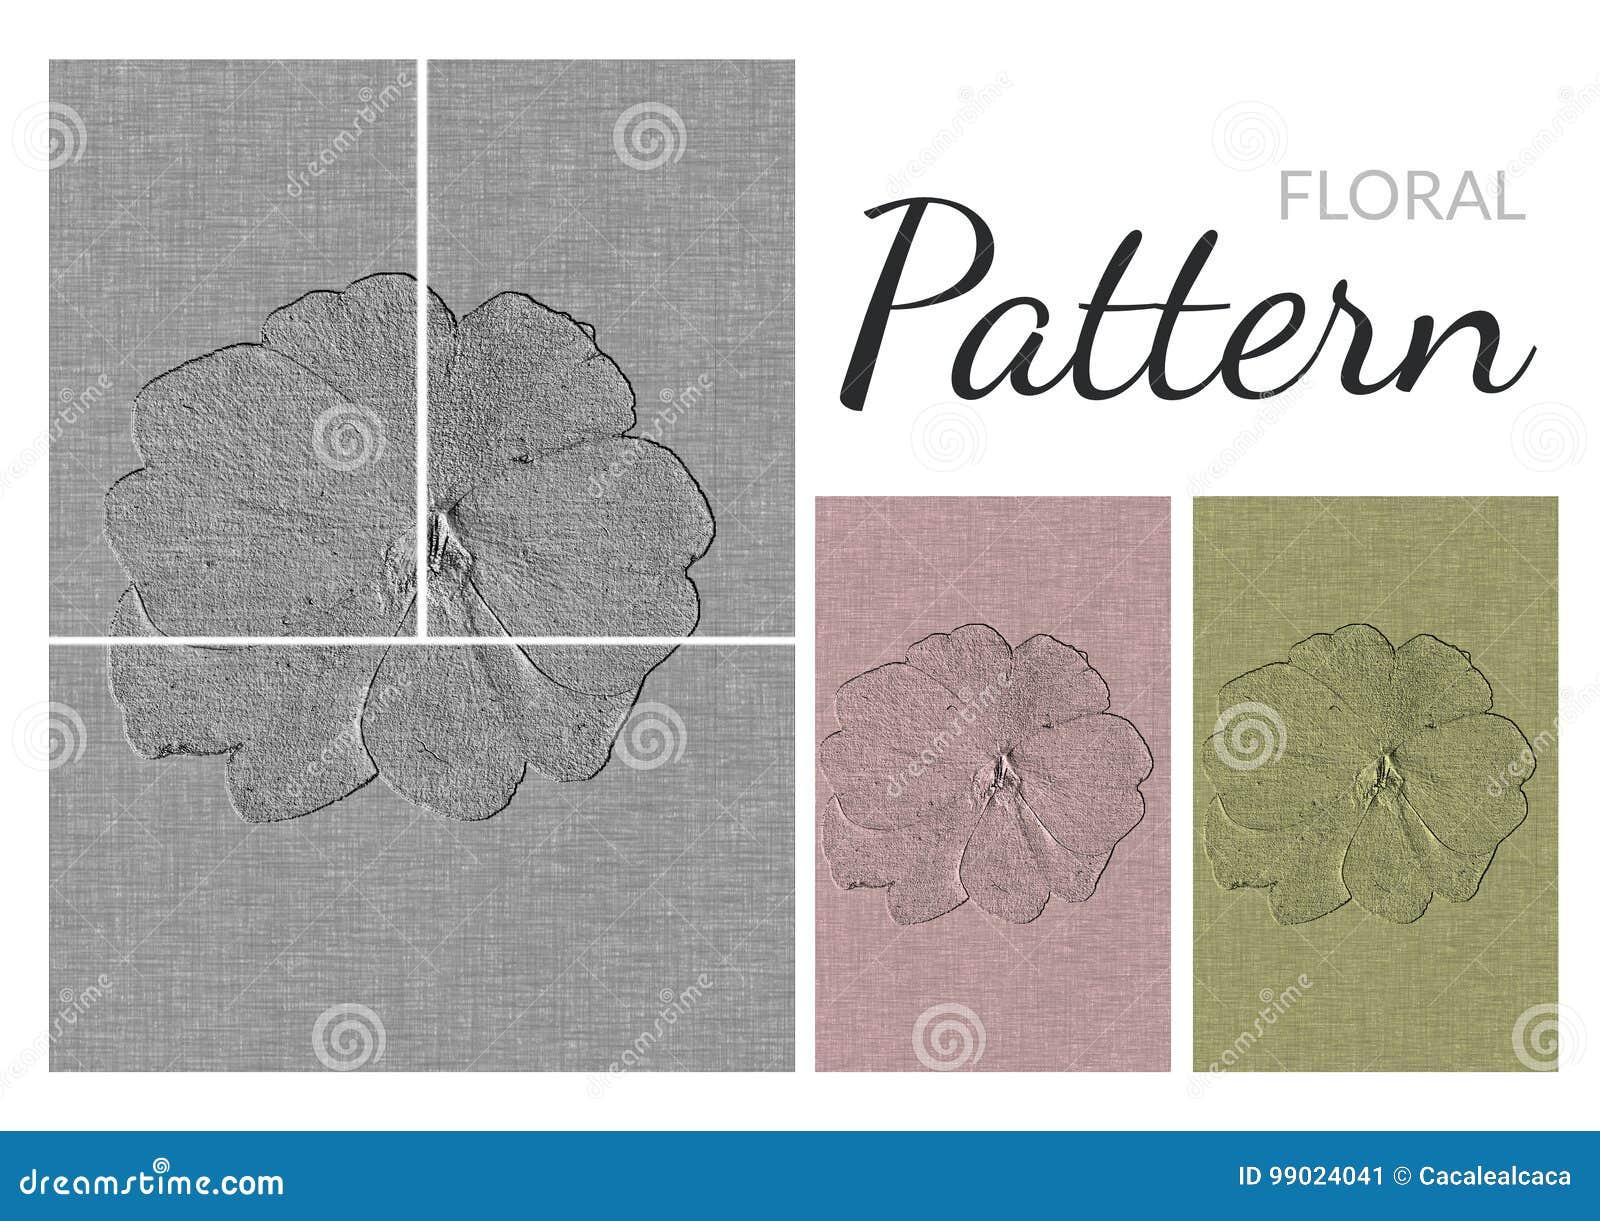 Floral pattern impatiens flower stock illustration illustration download floral pattern impatiens flower stock illustration illustration of beautify biology 99024041 ccuart Gallery